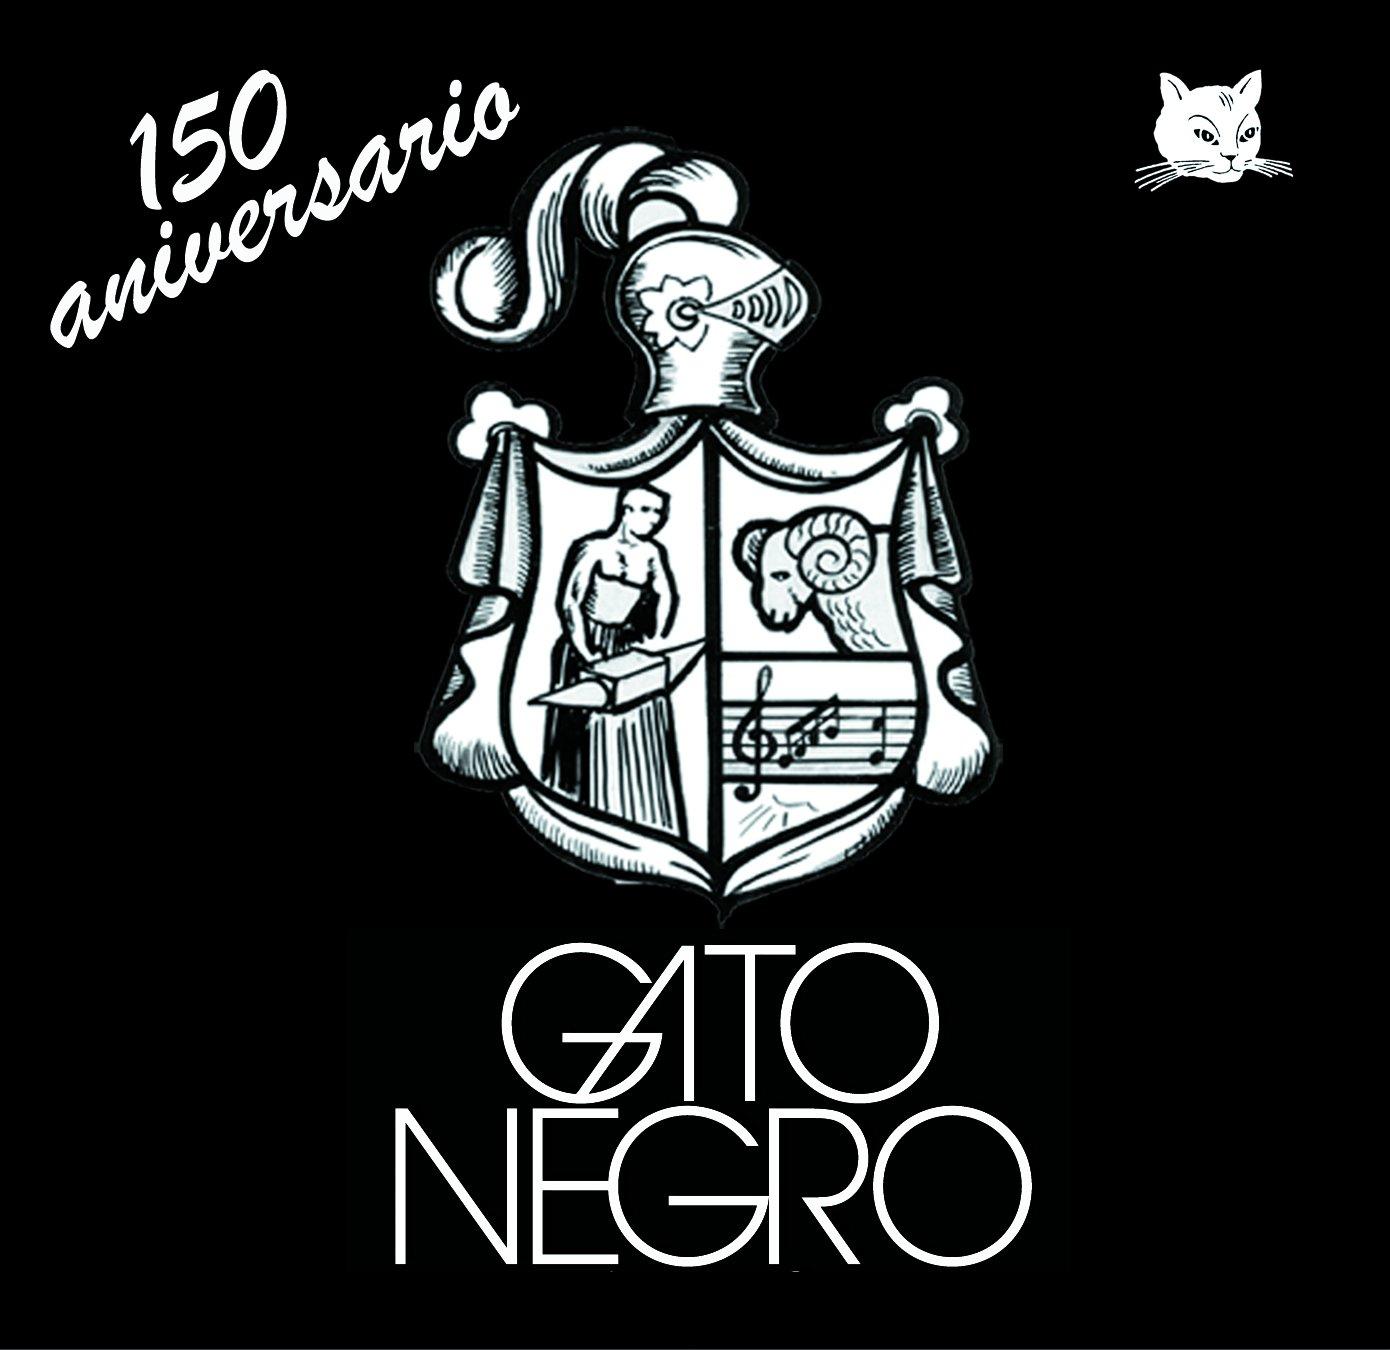 Juego de cuerdas Gato Negro 150 Aniversario para guitarra cl/ásica.